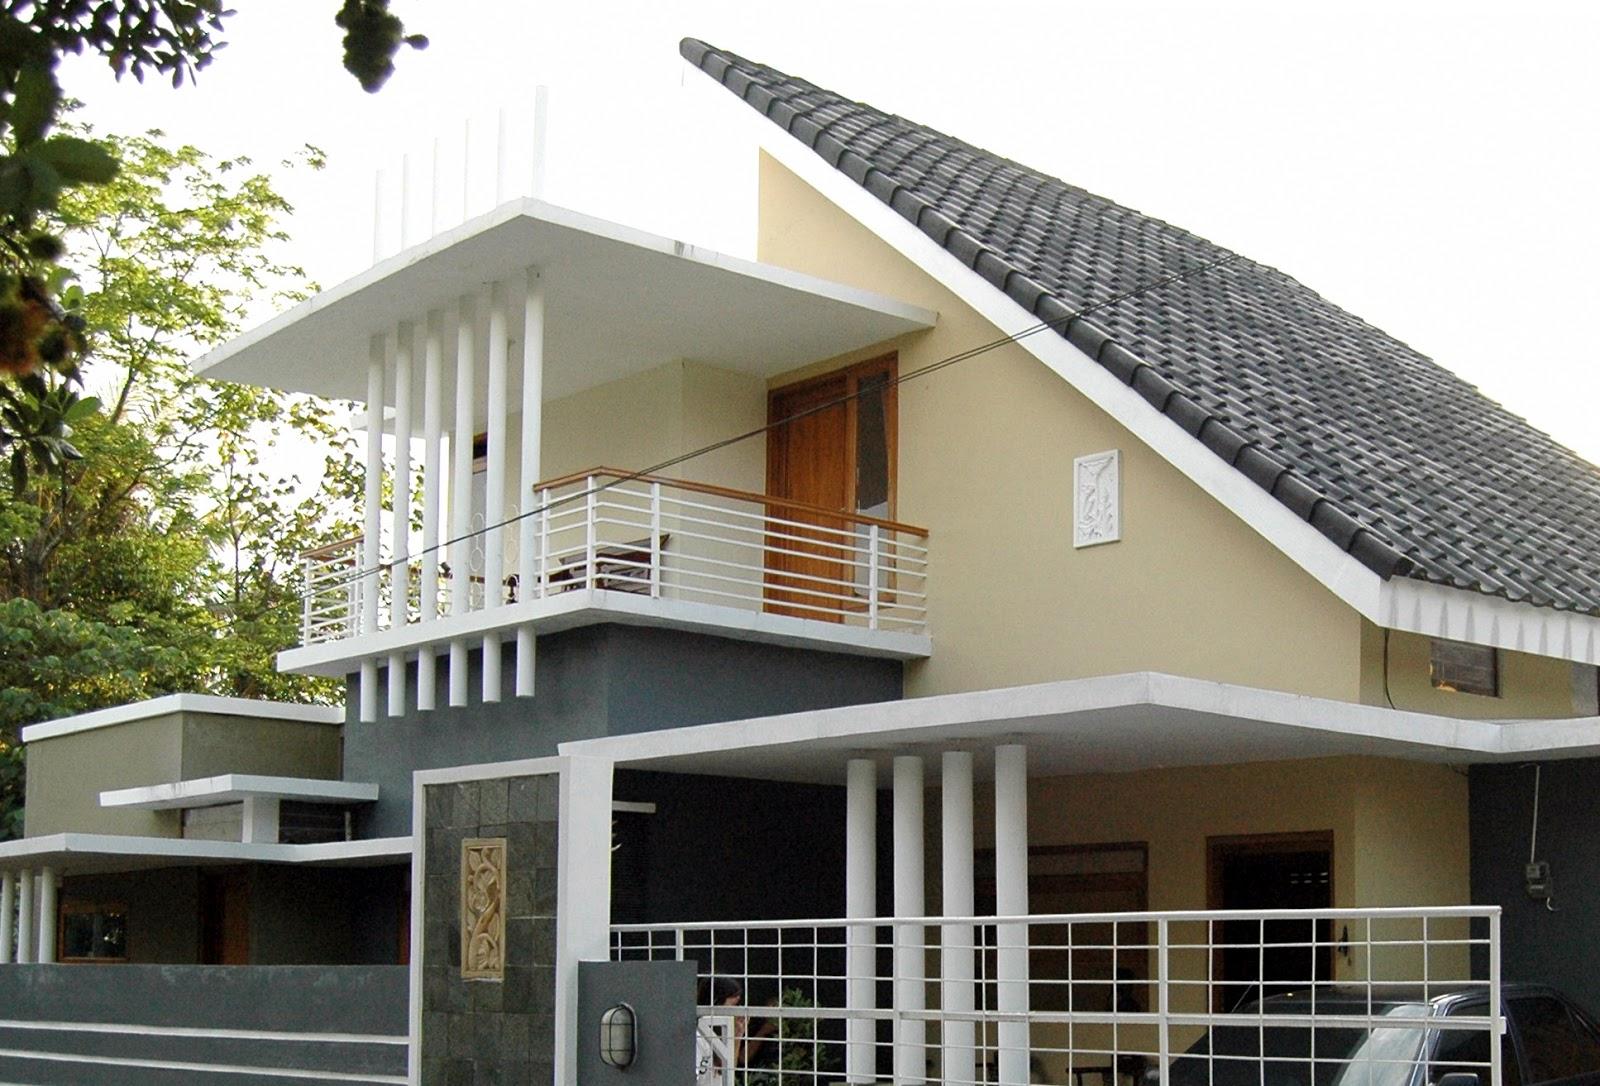 Desain Rumah 2016 Minimalis Atap Miring Images 2 Lantai